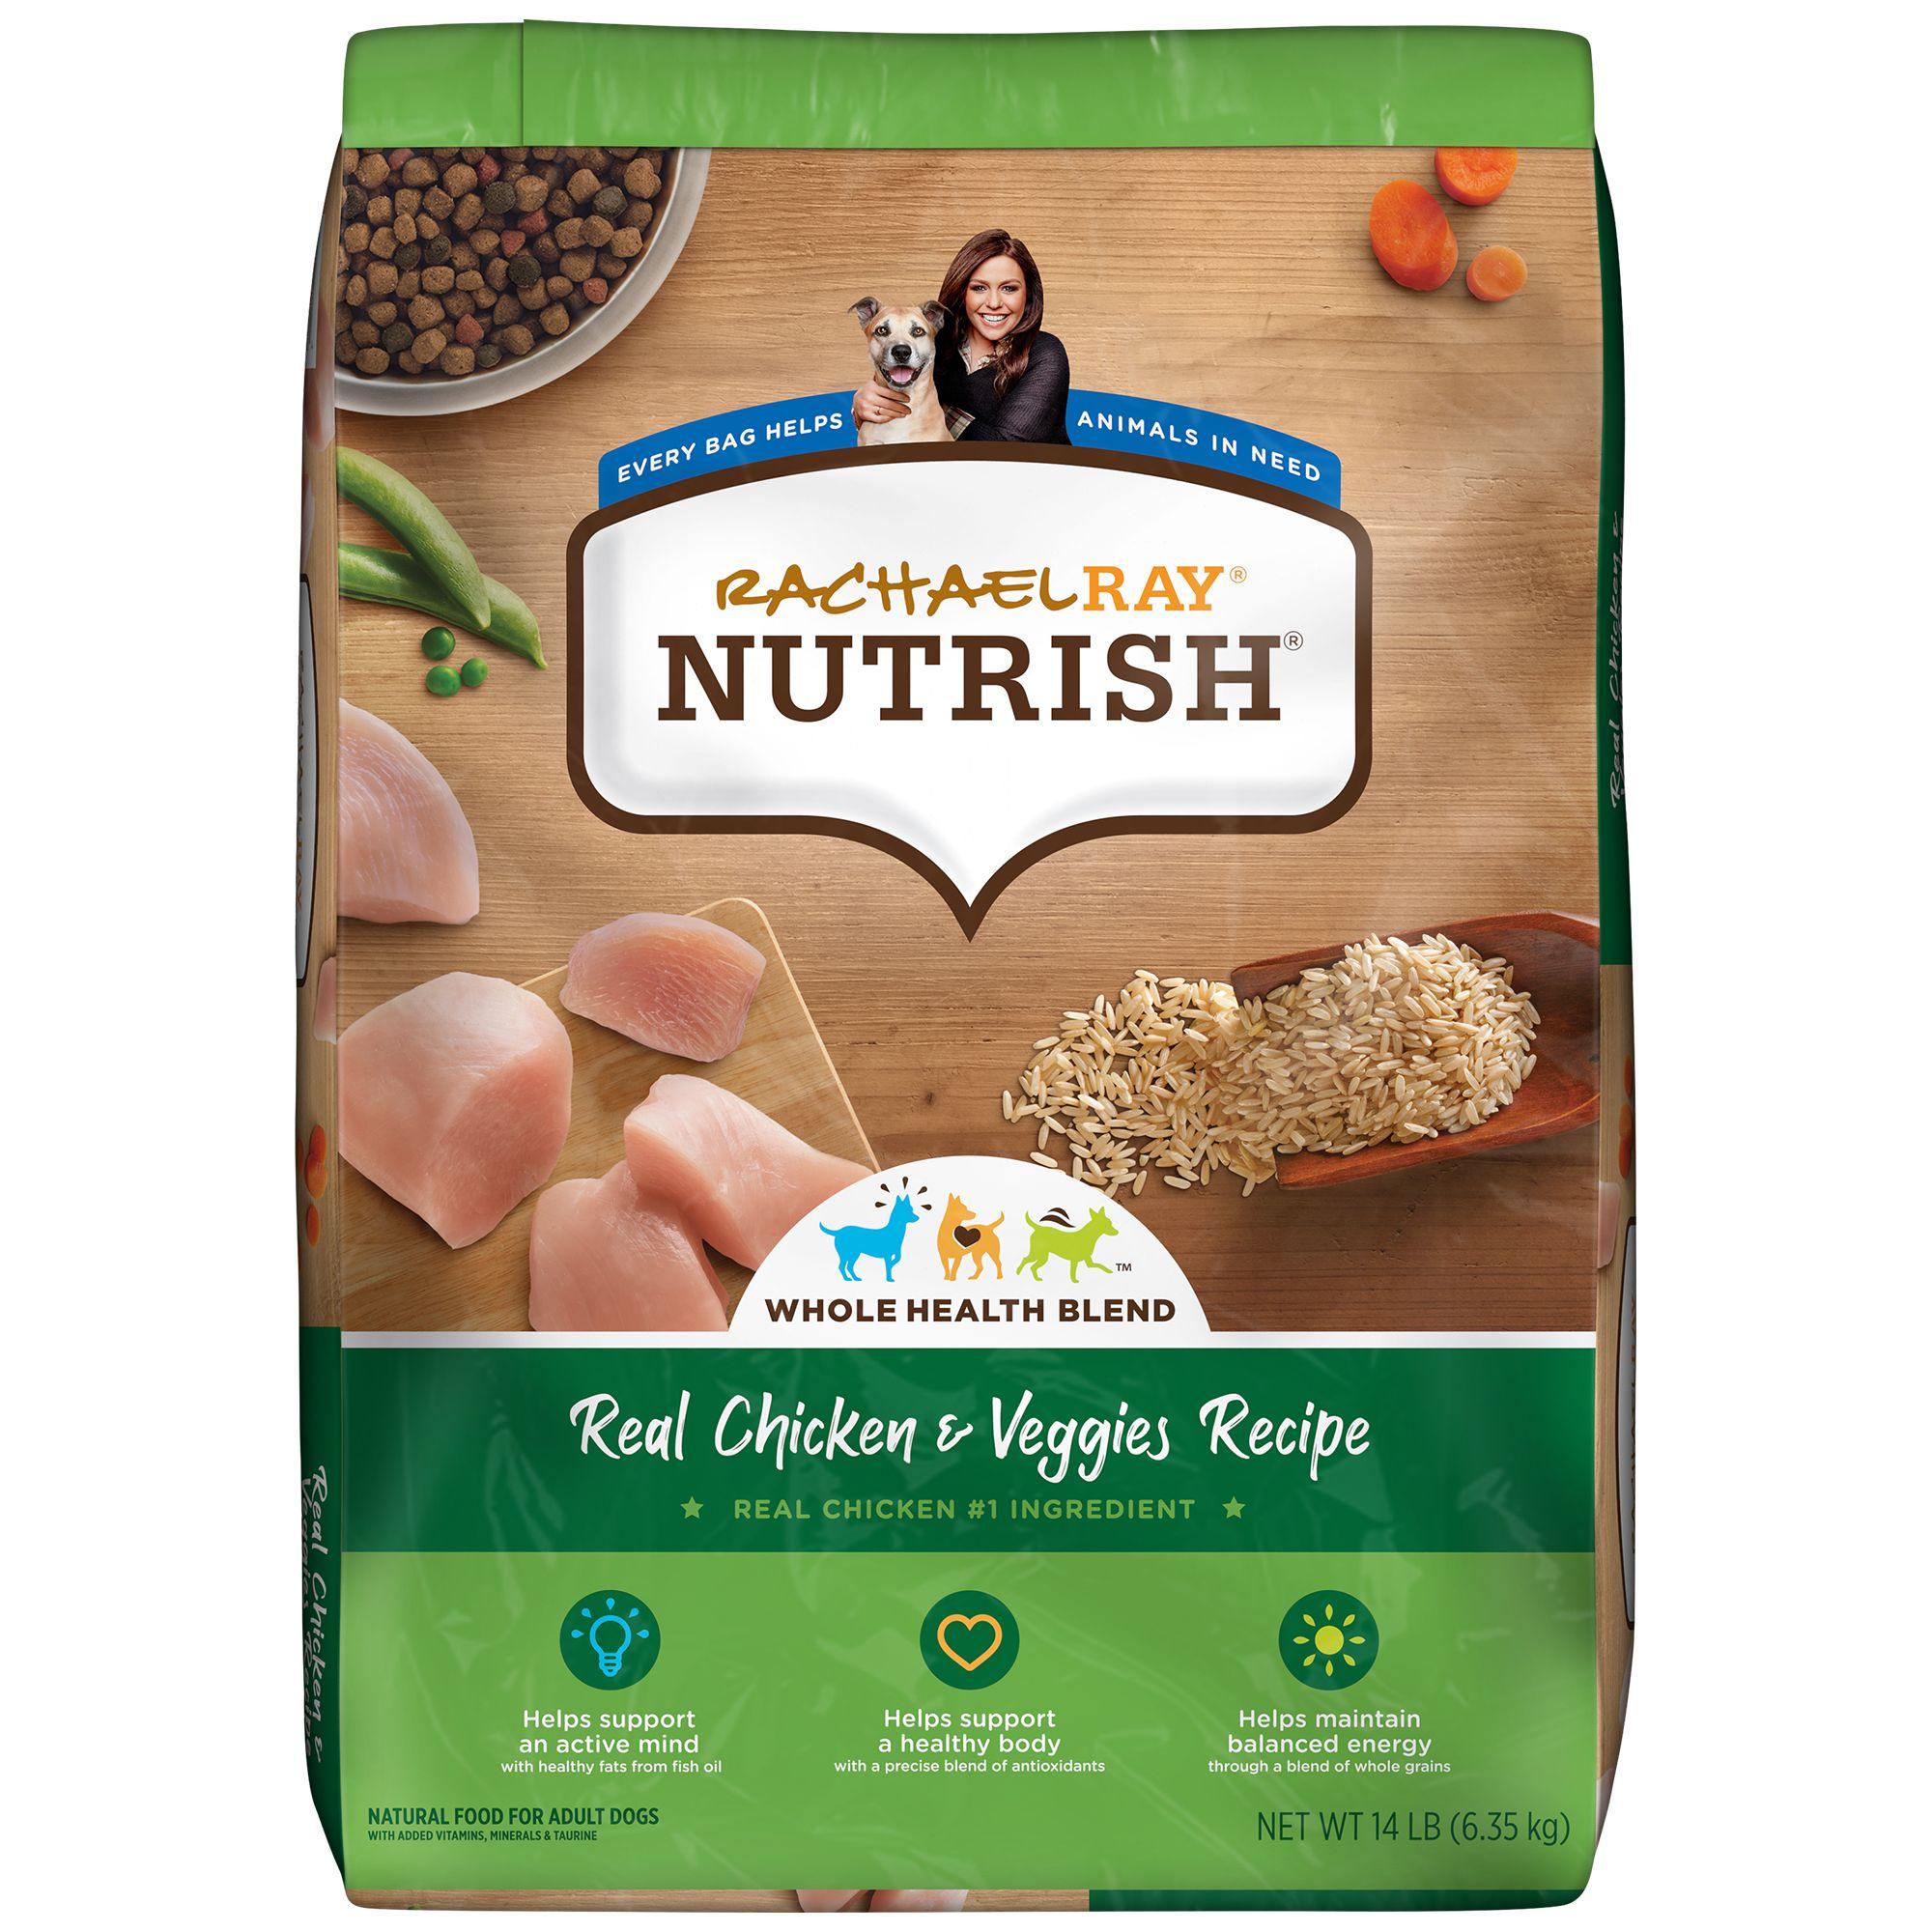 Rachael Ray Nutrish Dog Food Natural Chicken Veggies Recipe